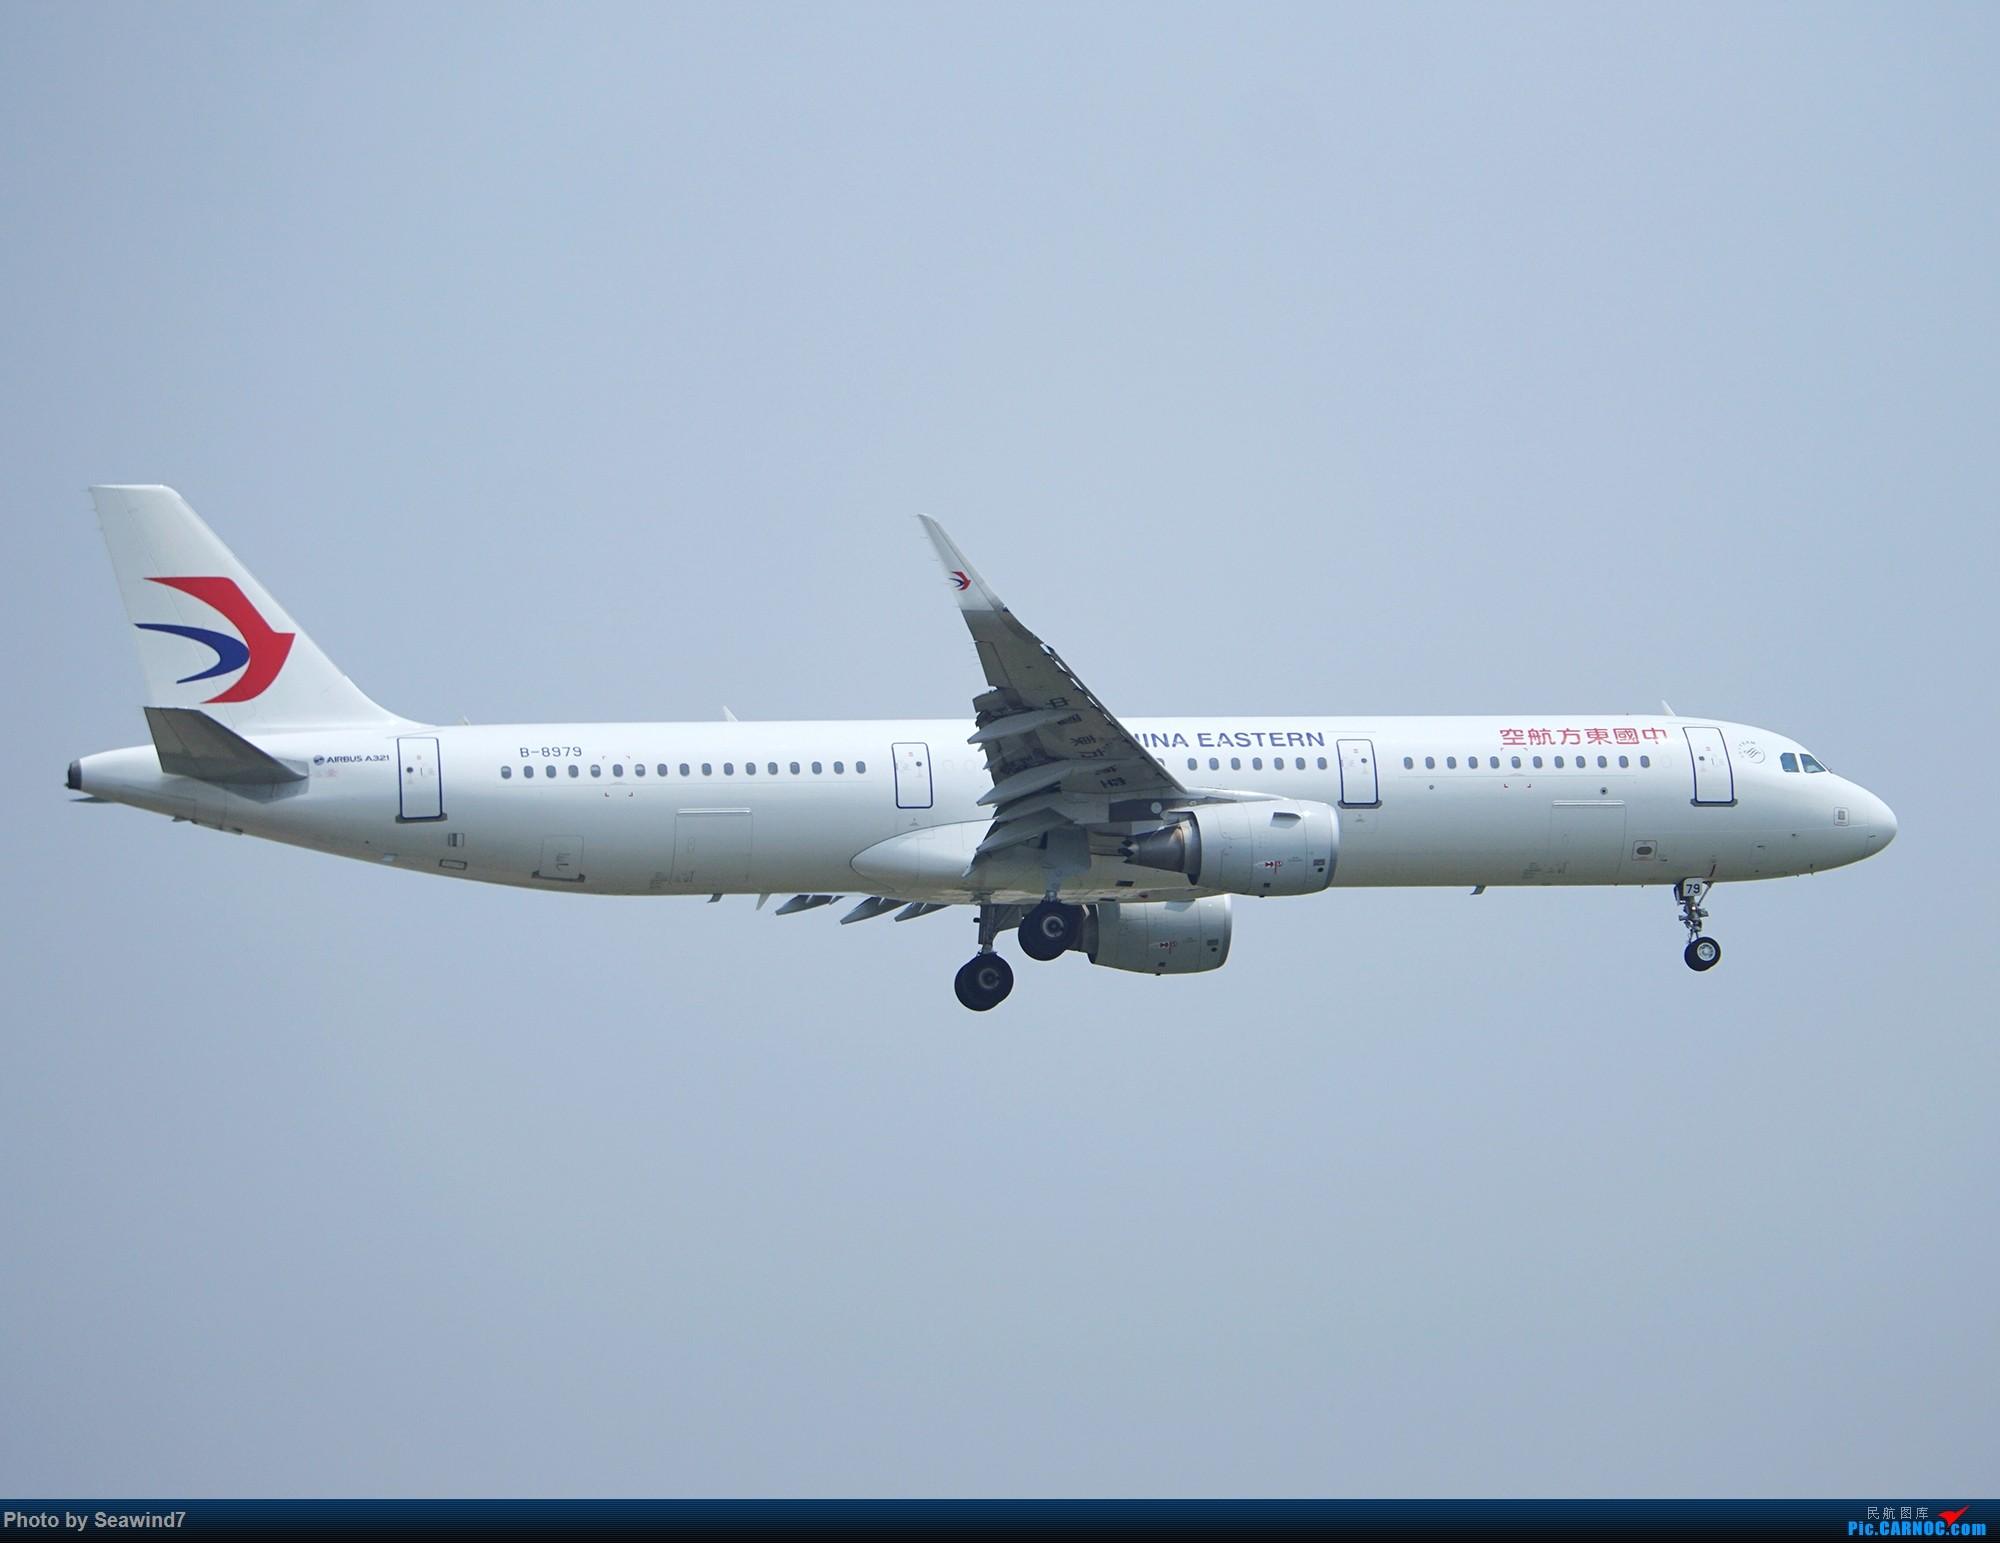 Re:[原创]新手的五一假期(含玩具总动员) AIRBUS A321-200 B-8979 中国上海虹桥国际机场